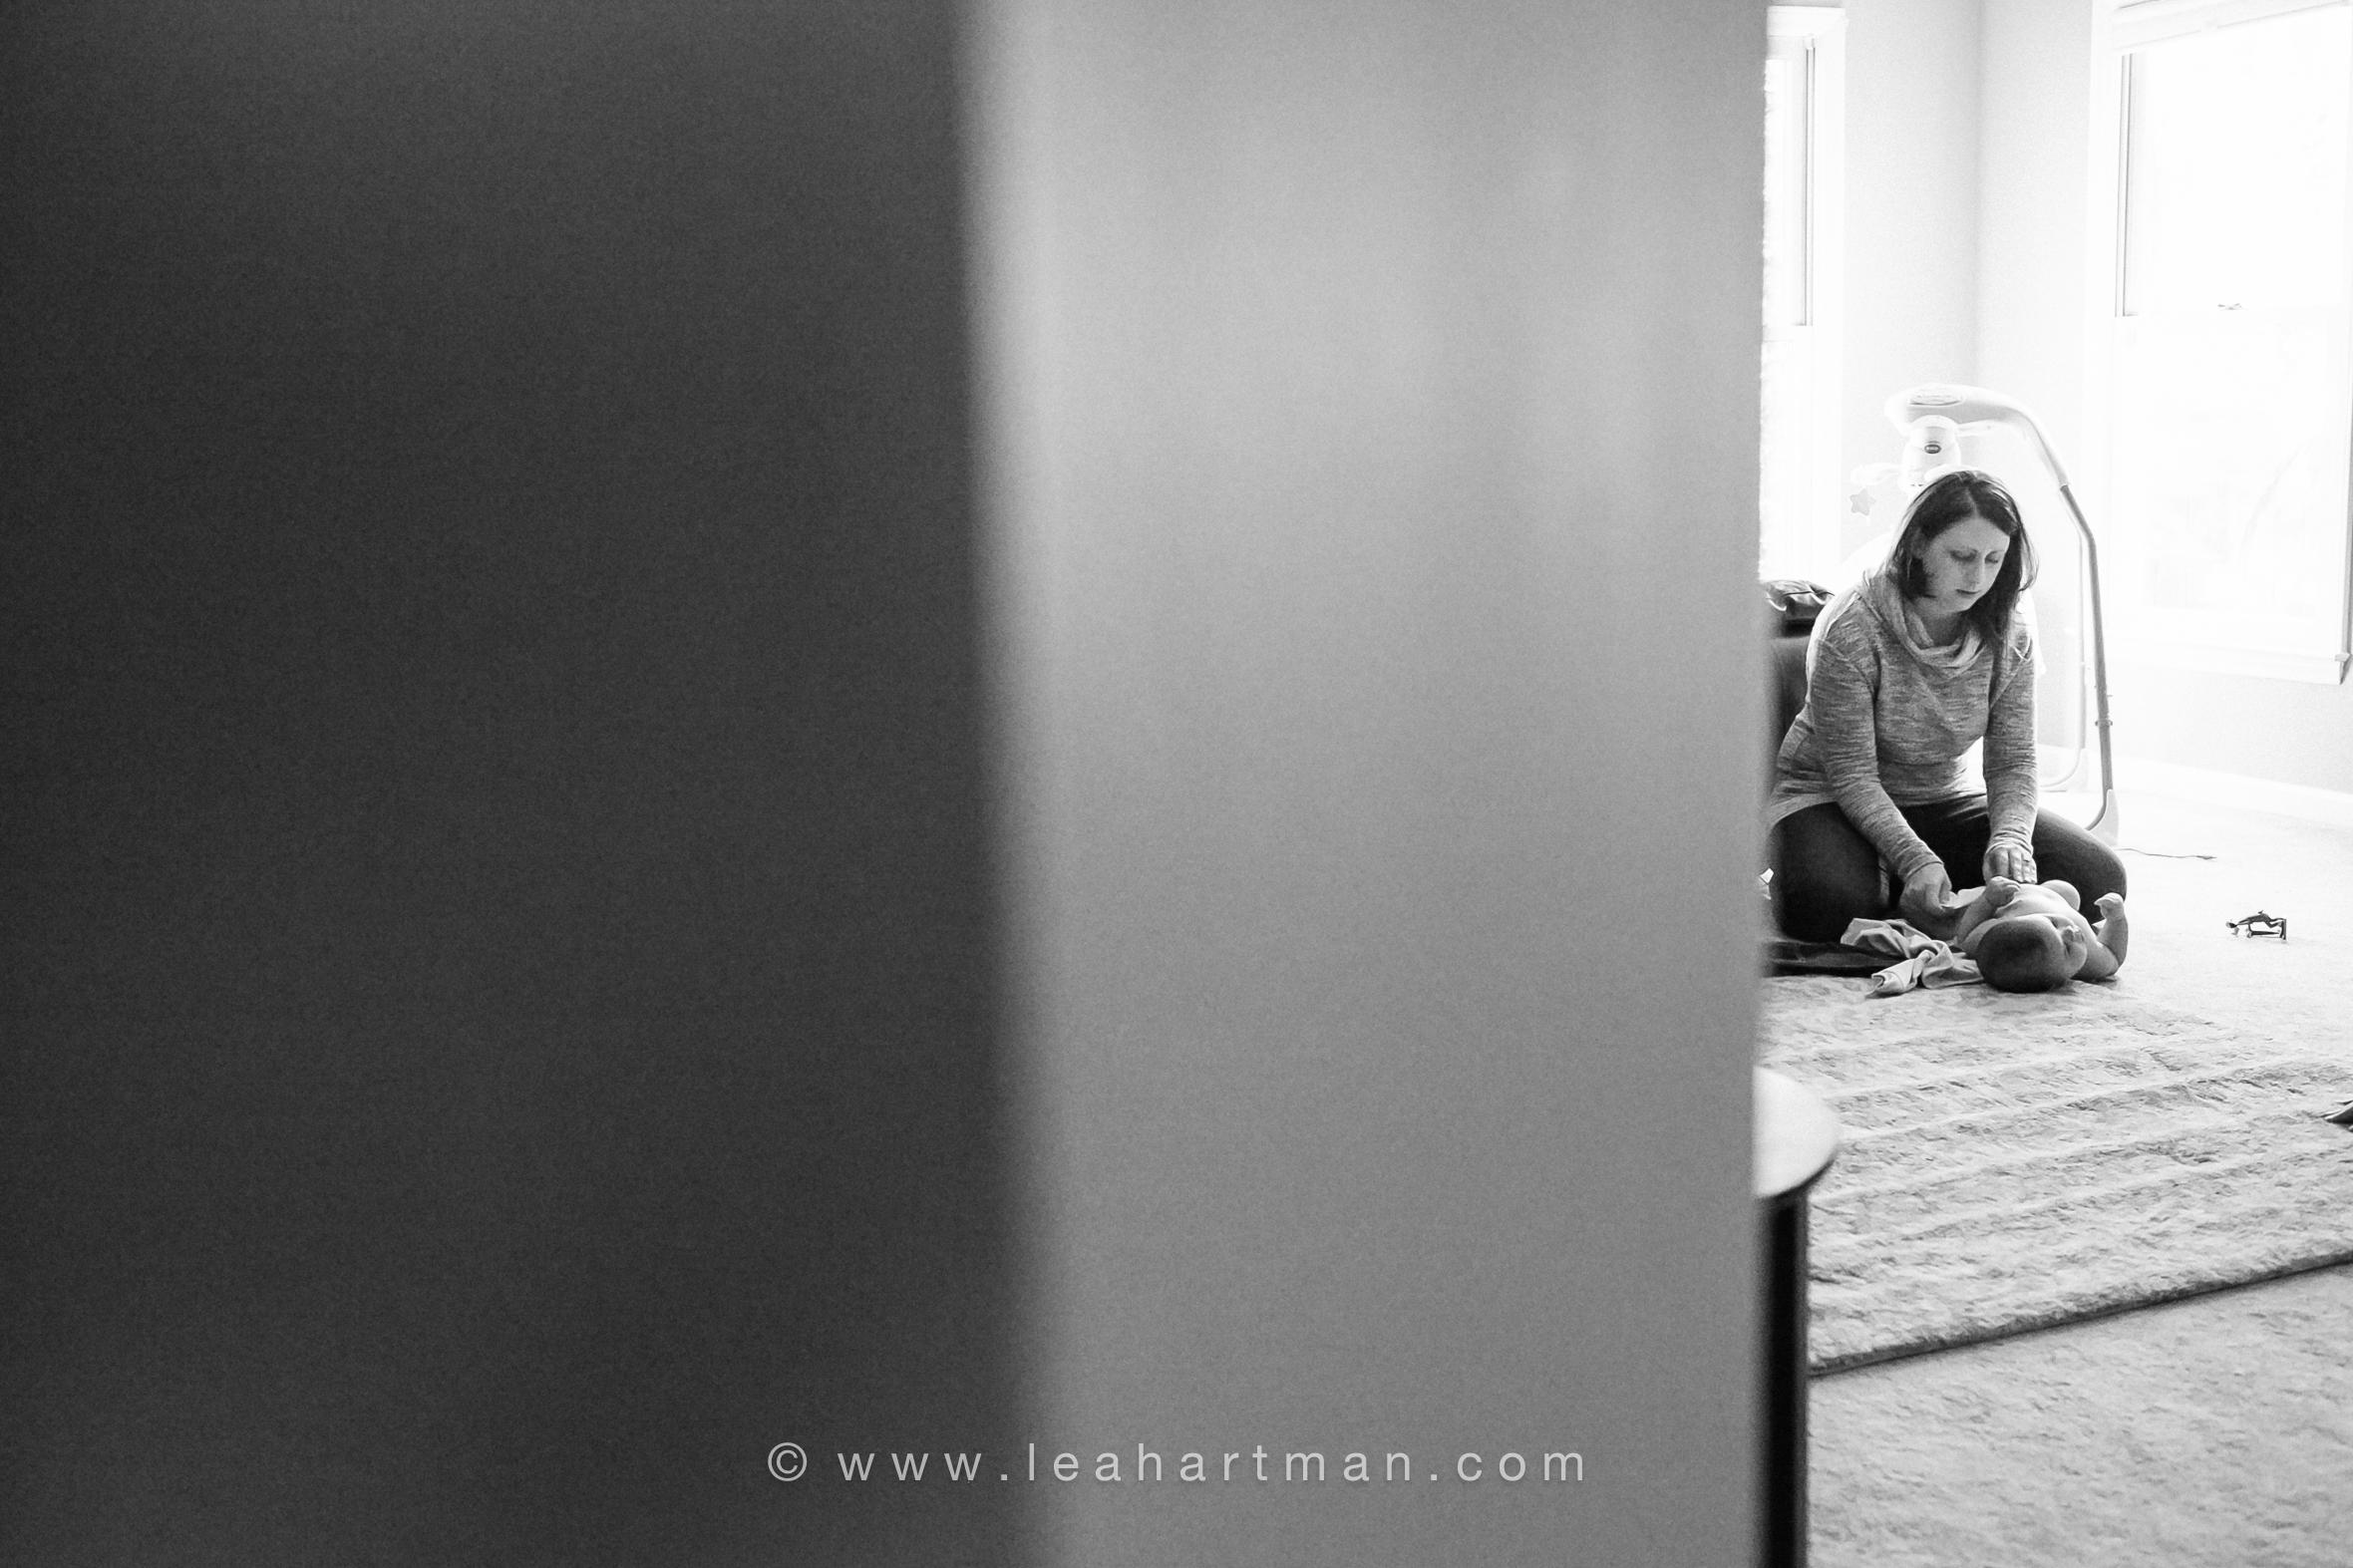 Lea Hartman Photography